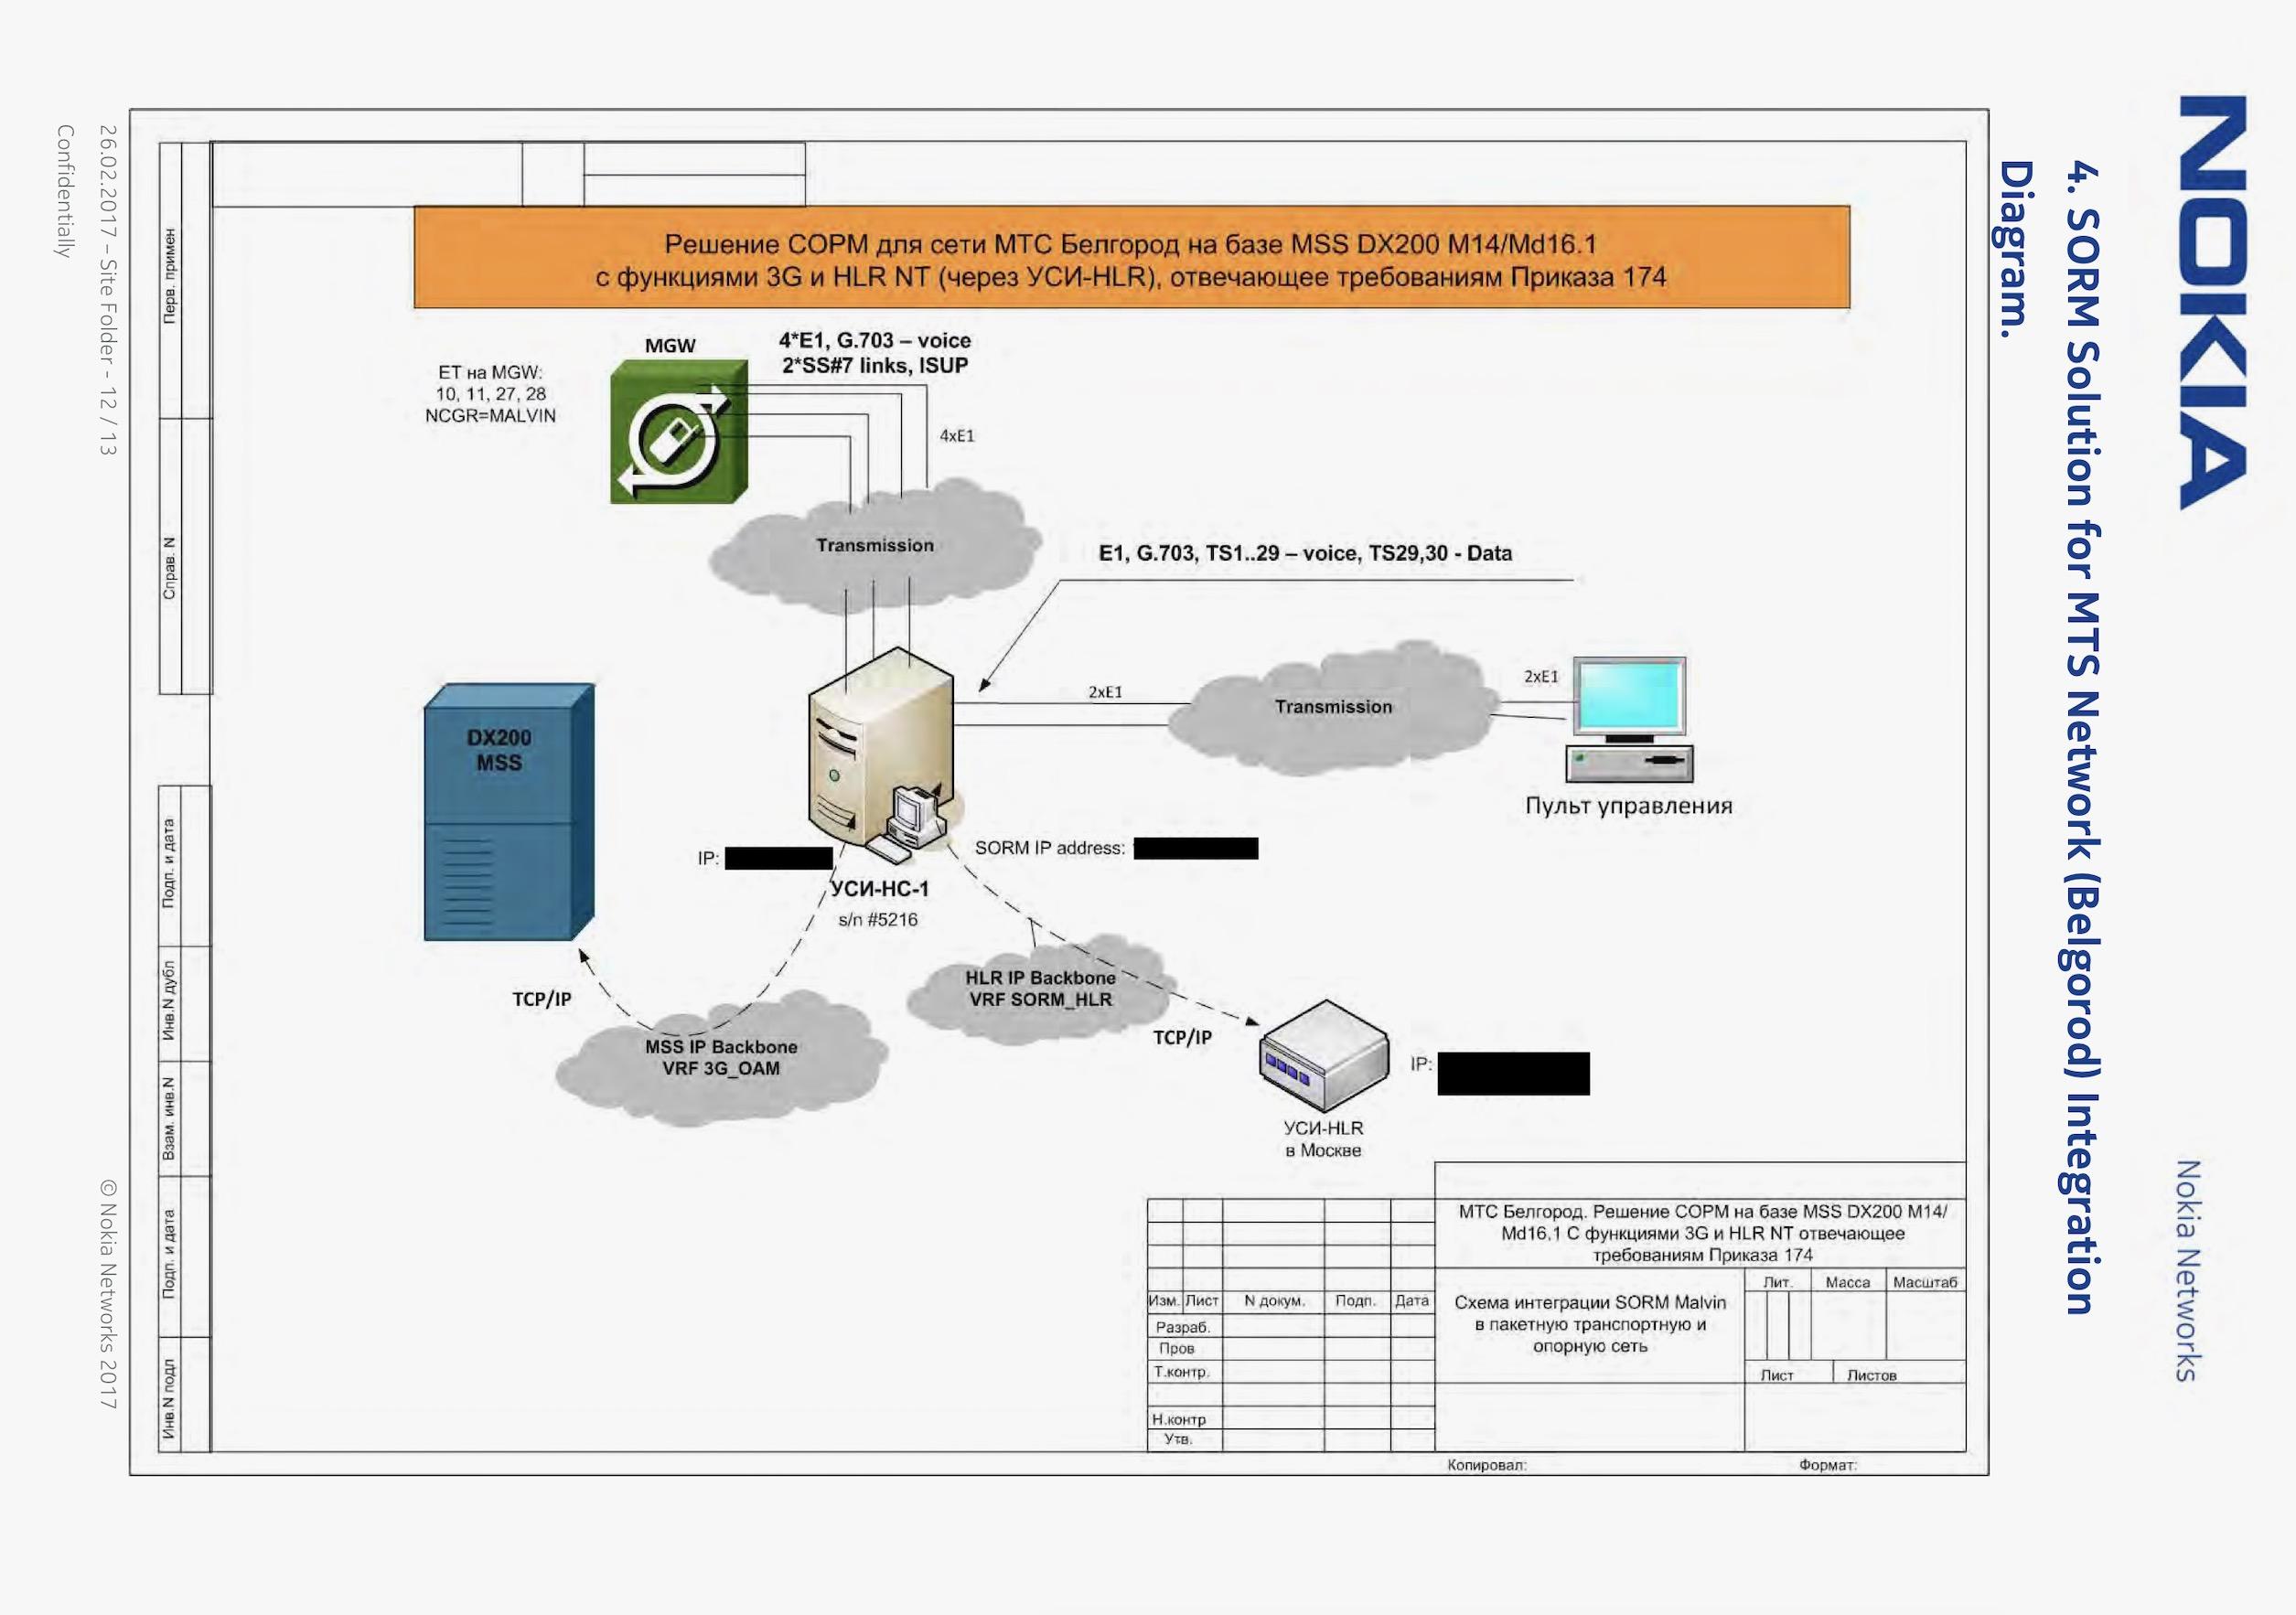 nokia-network-map